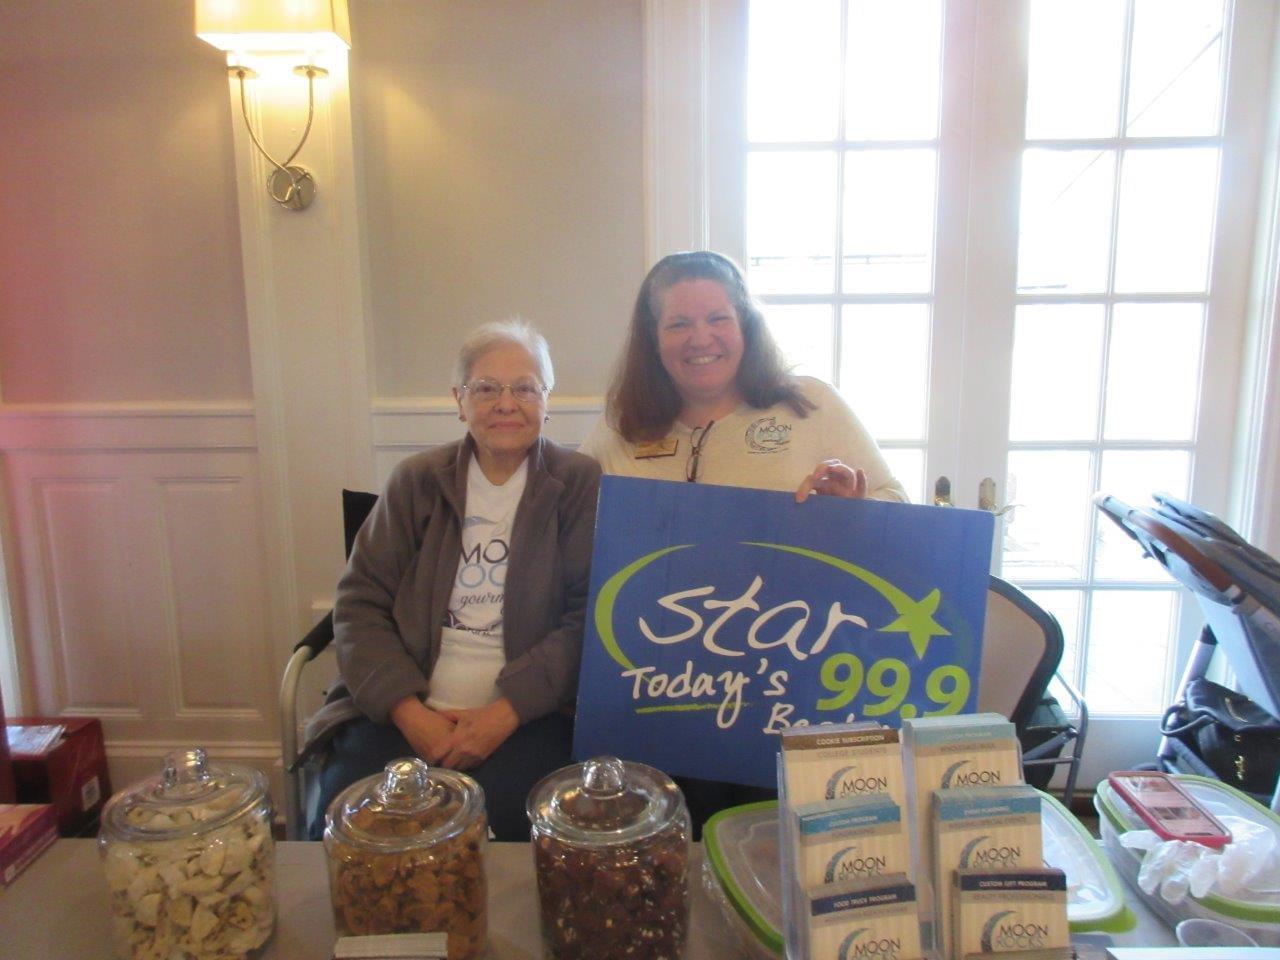 STAR 99.9 & The Taste of Fairfield! 1/26/20